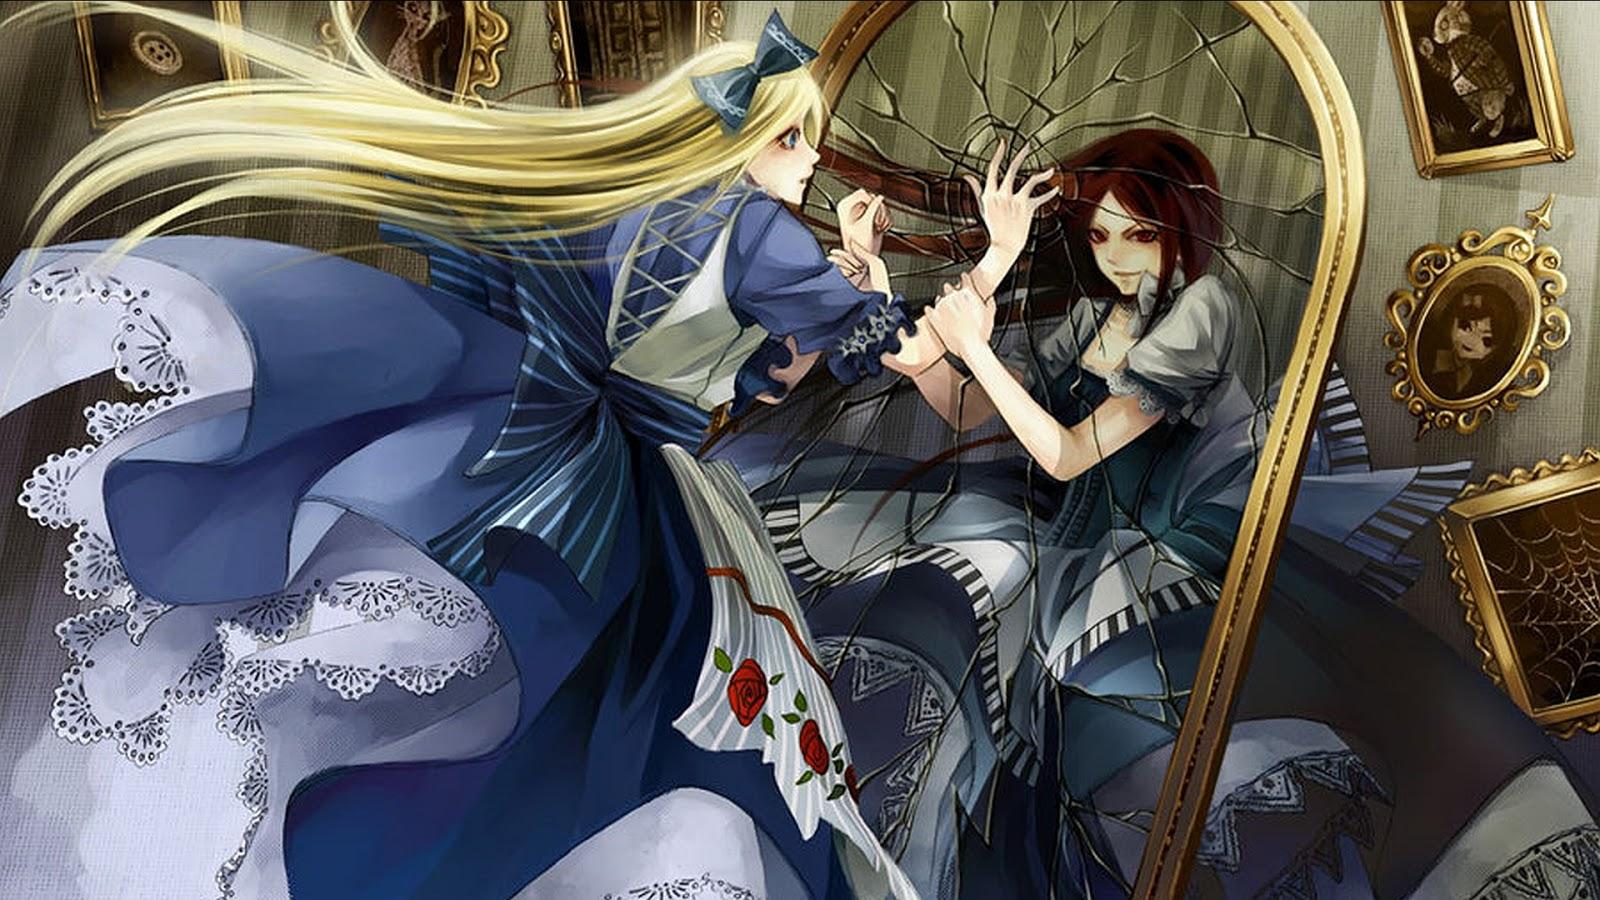 Free Download Alice In Wonderland Imagenes Anime Y Algo Ms